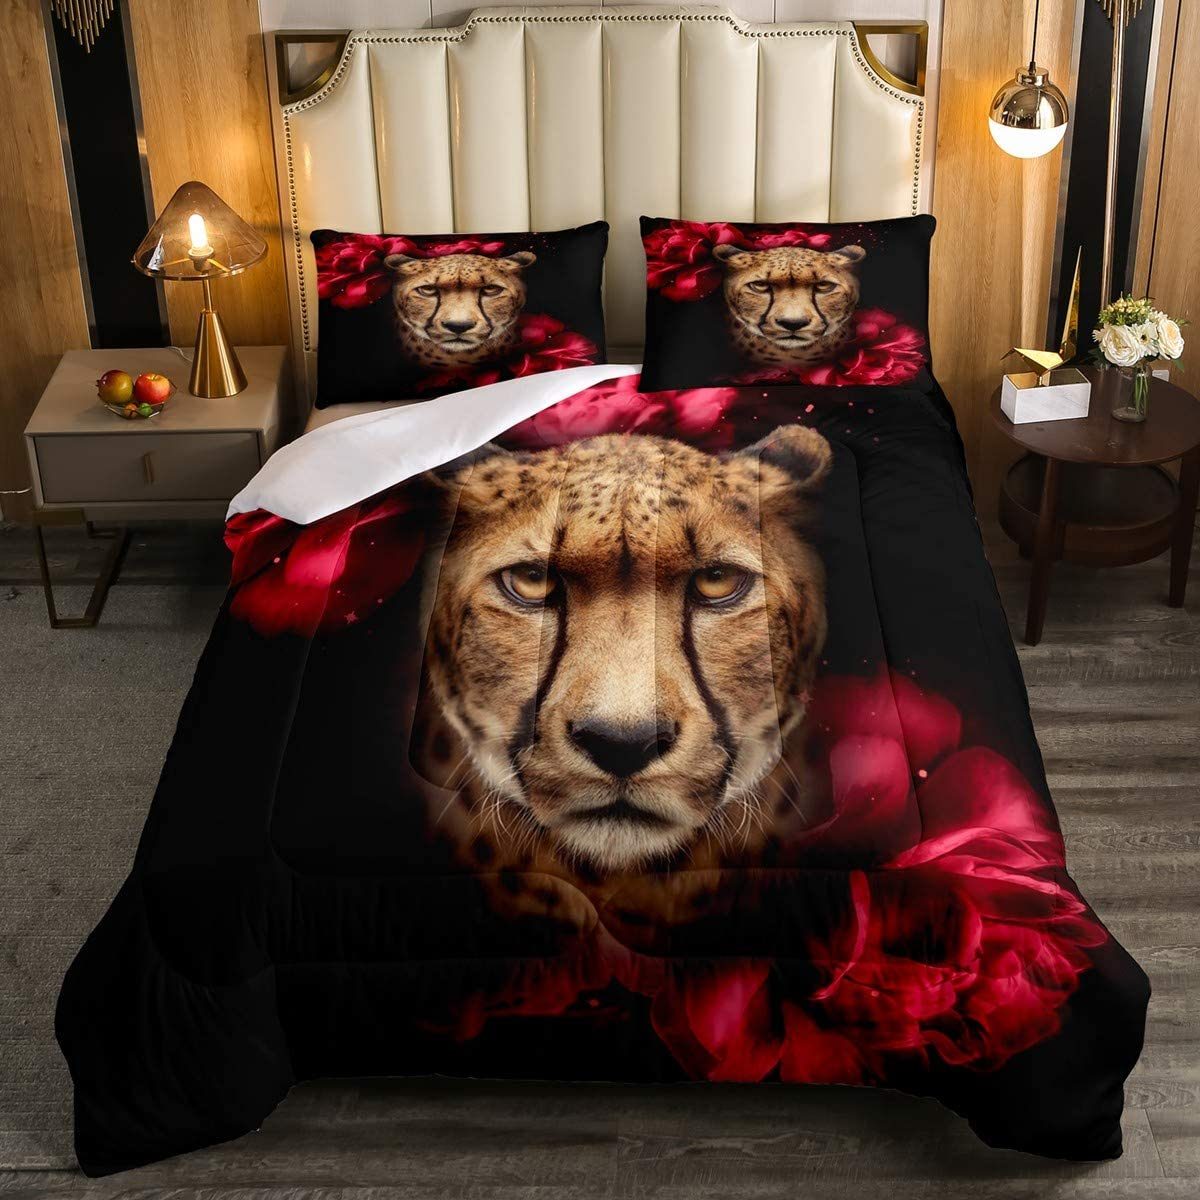 Erosebridal Cheetah Comforter Set, Leopard Print DownComforter Queen Size, African Animal and Flower Bedding Comforters, Home Fashion Bedroom Decor 3 Piece Bedding Comforters with 2 Pillow Cases